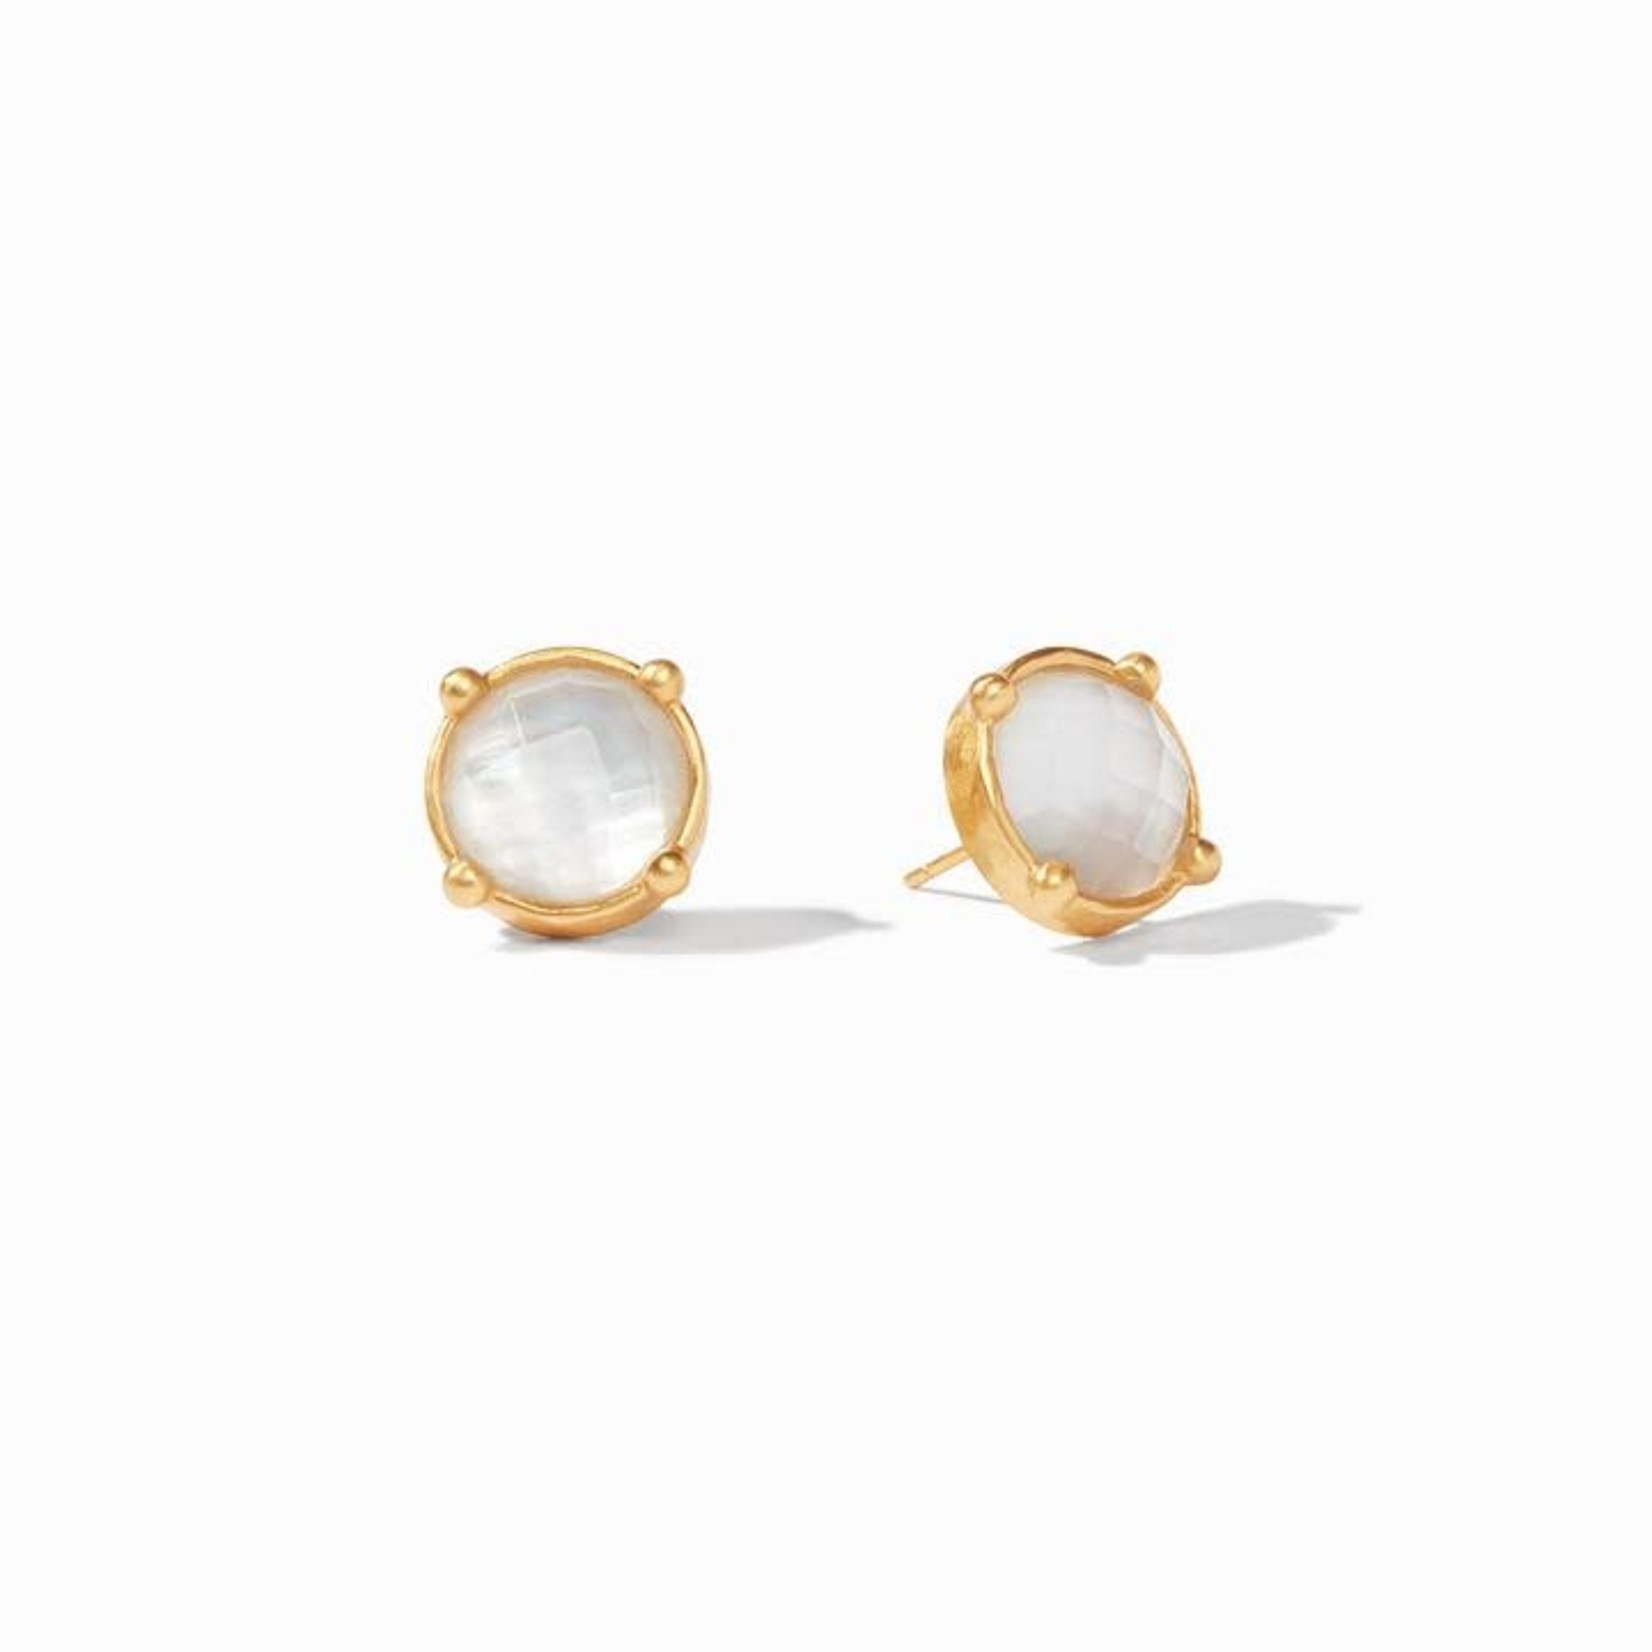 Julie Vos Honey Stud - Iridescent Clear Crystal